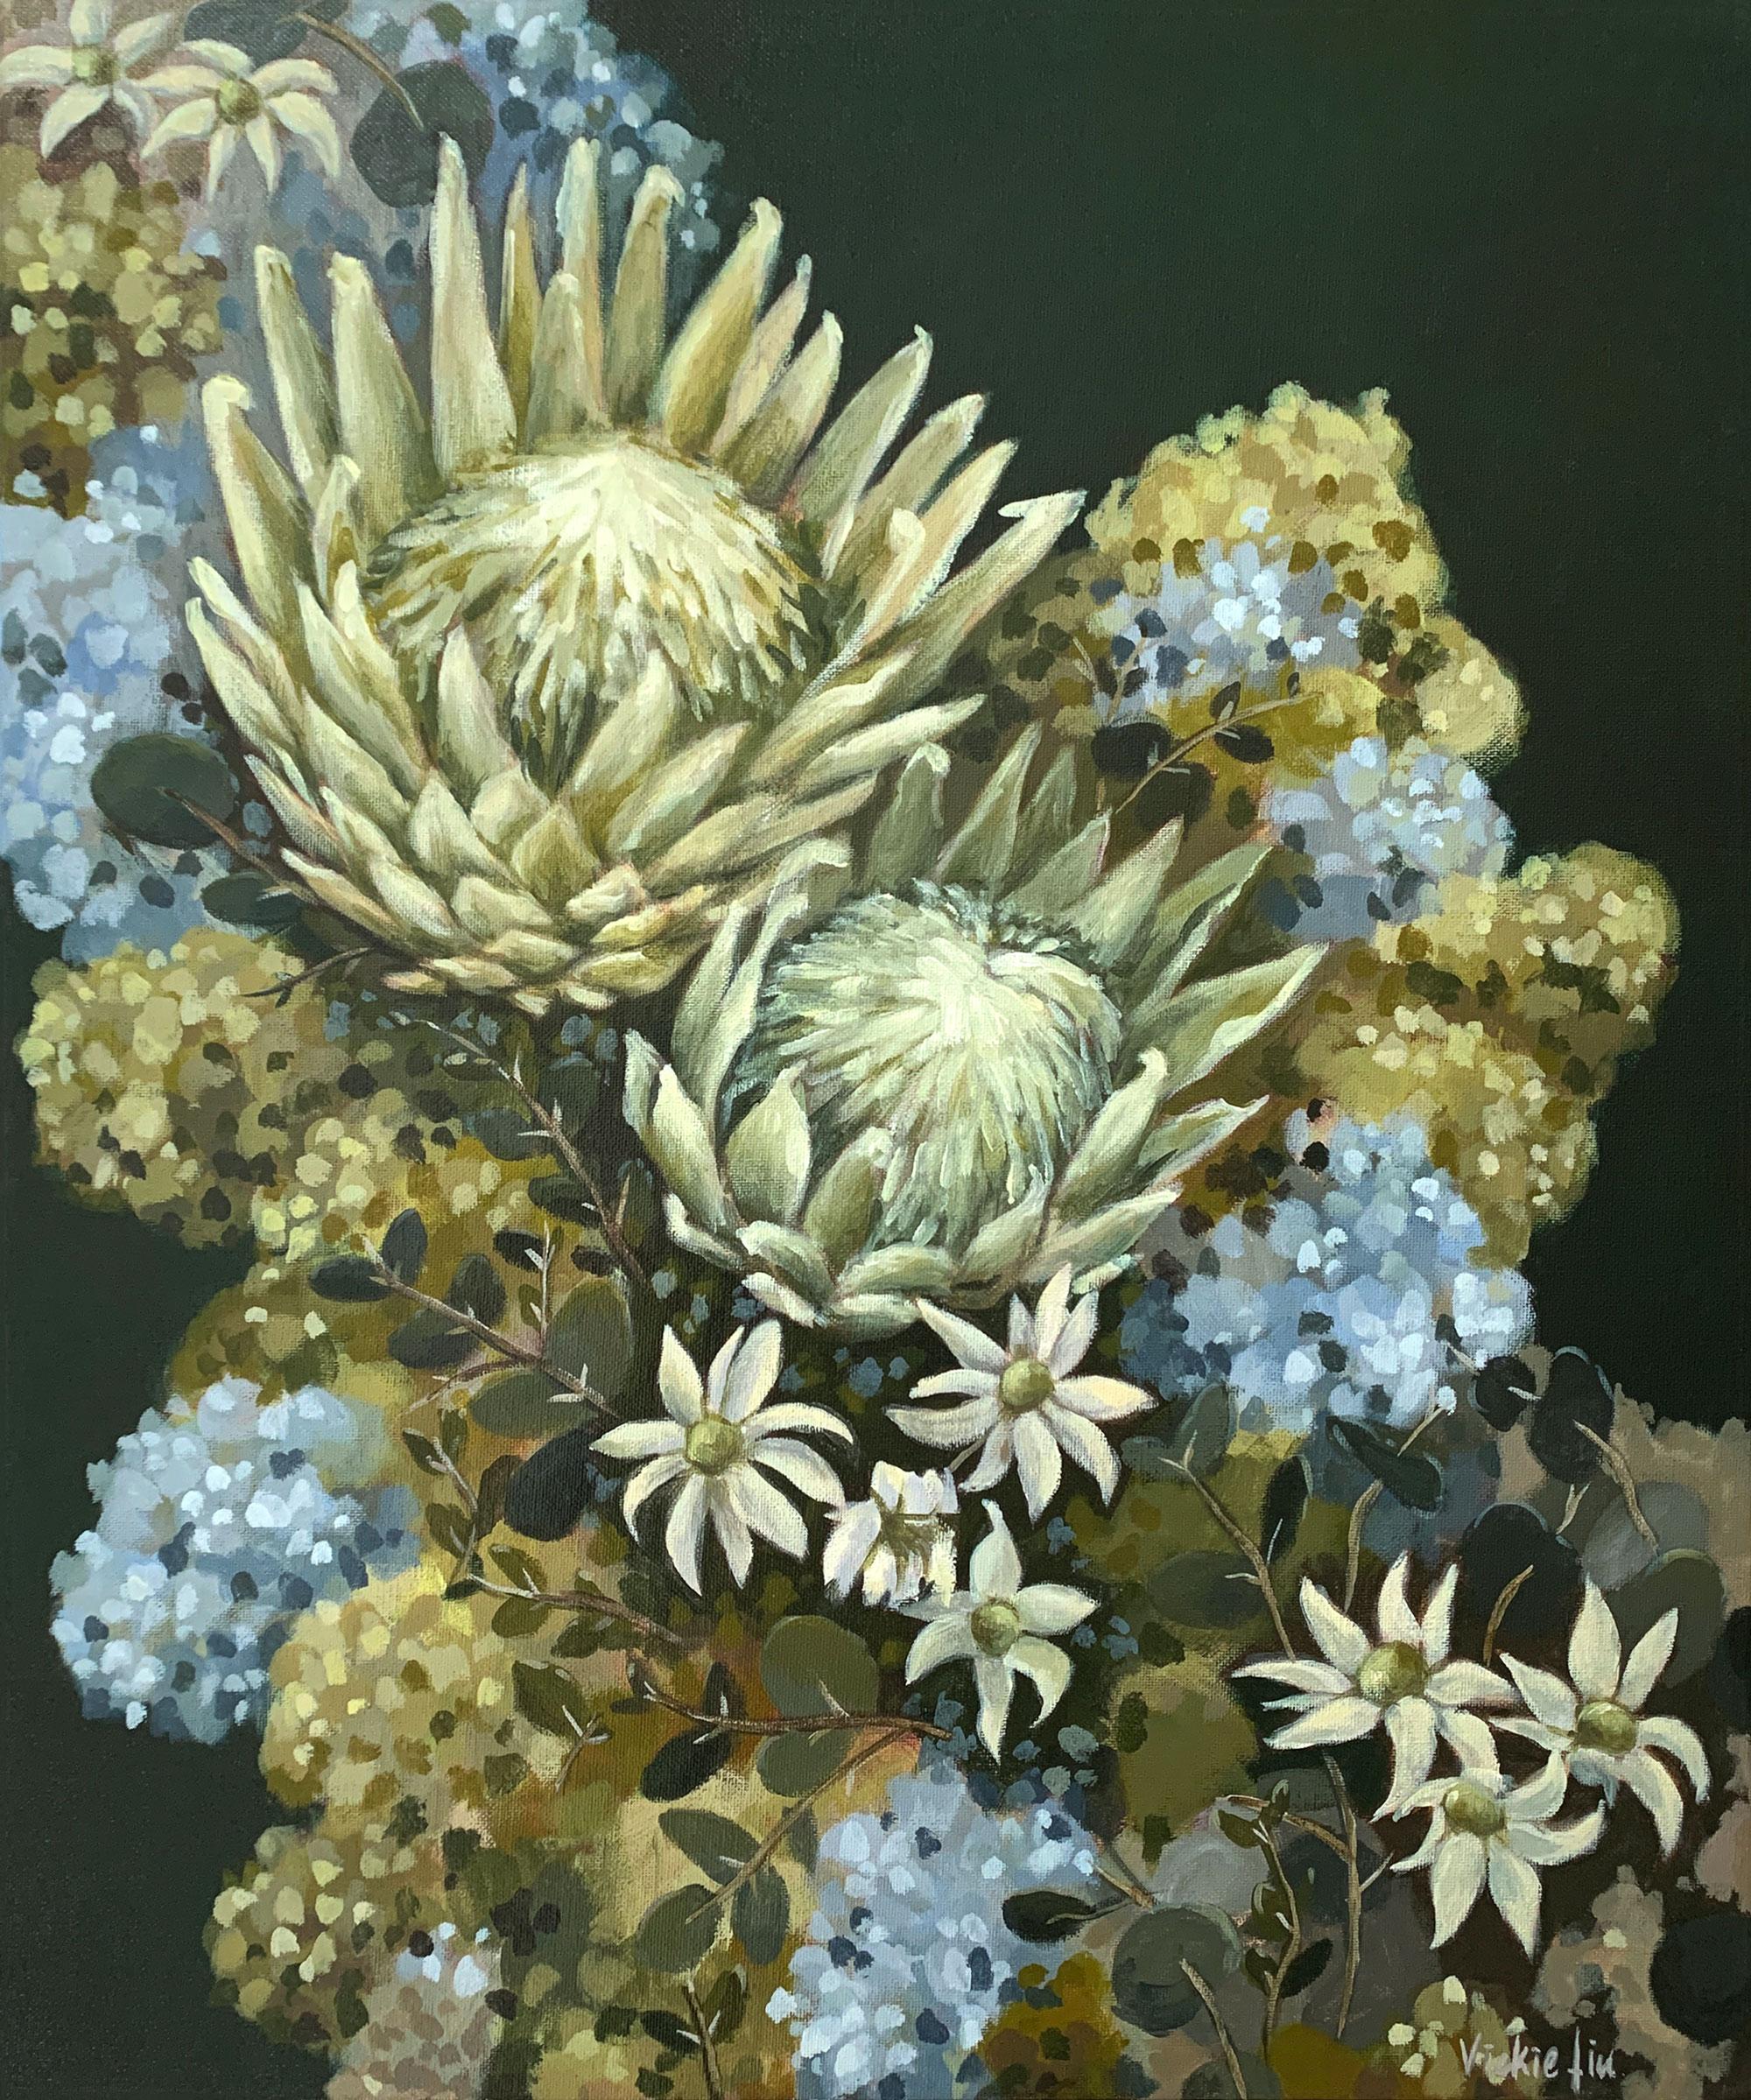 Vickie Liu Flannel Flowers Proteas And Hydrangeas 50×60